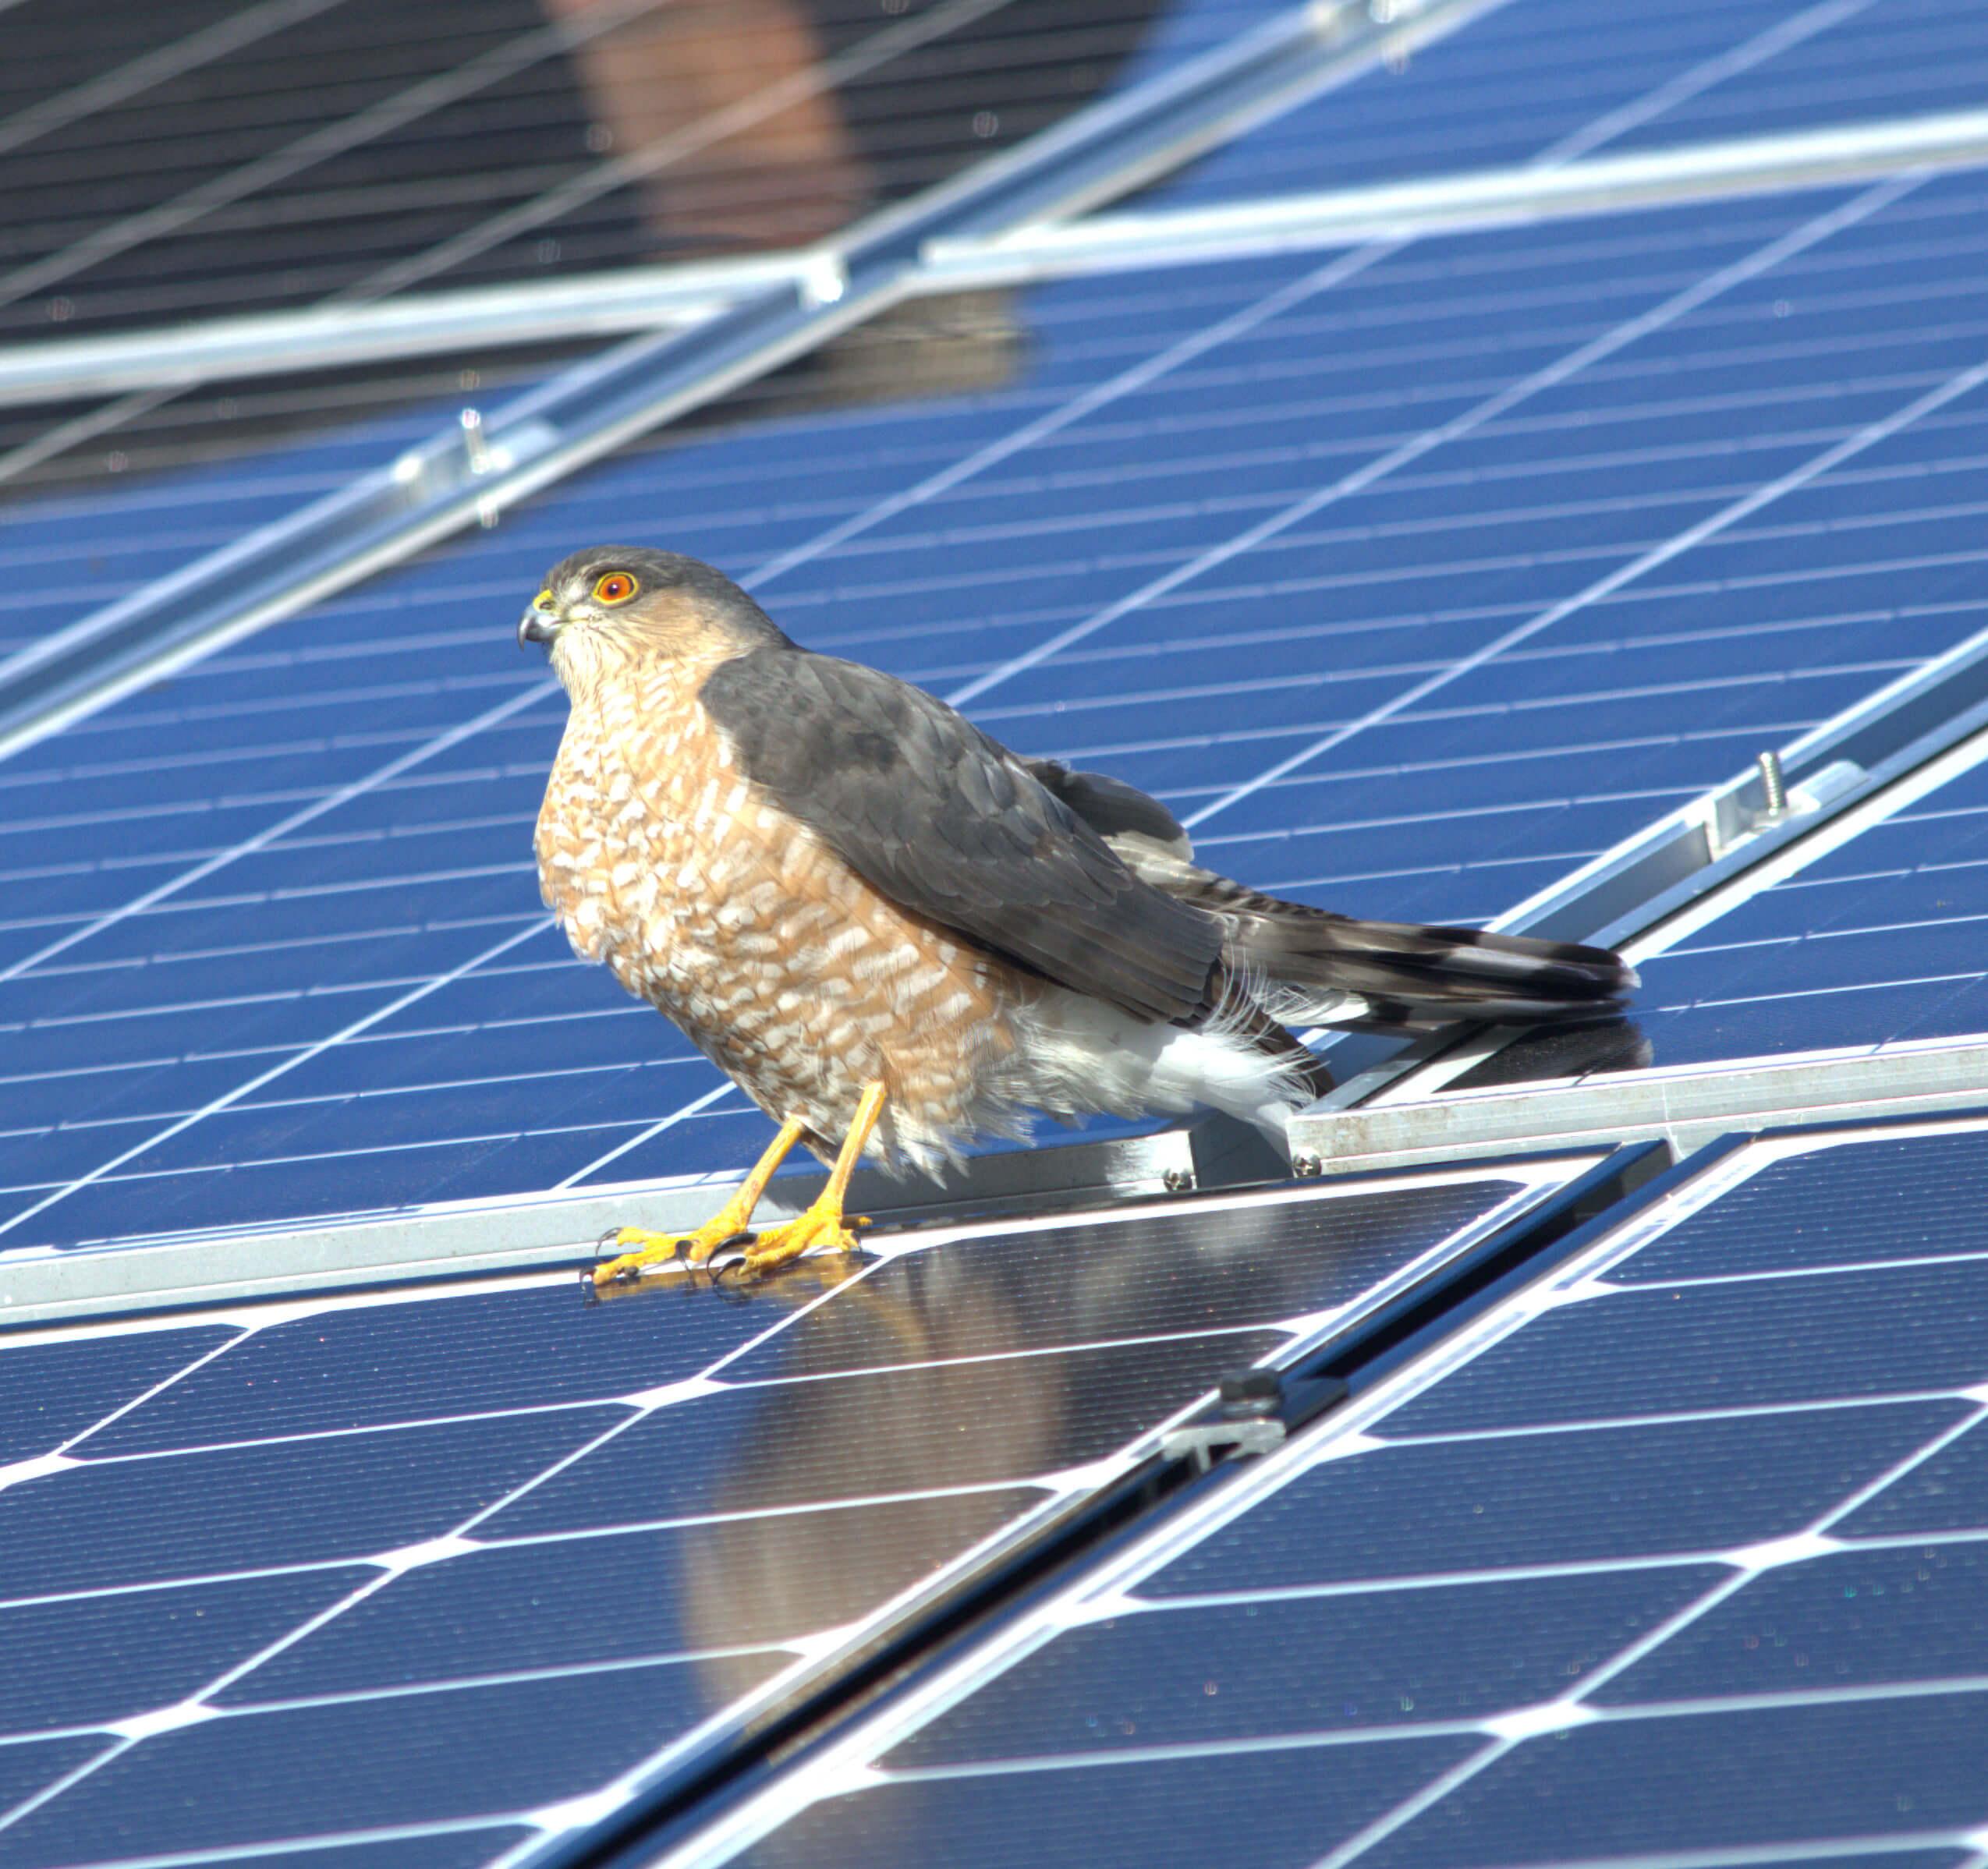 brockton massachusetts greater boston residential solar installation my generation energy sharp-shinned hawk